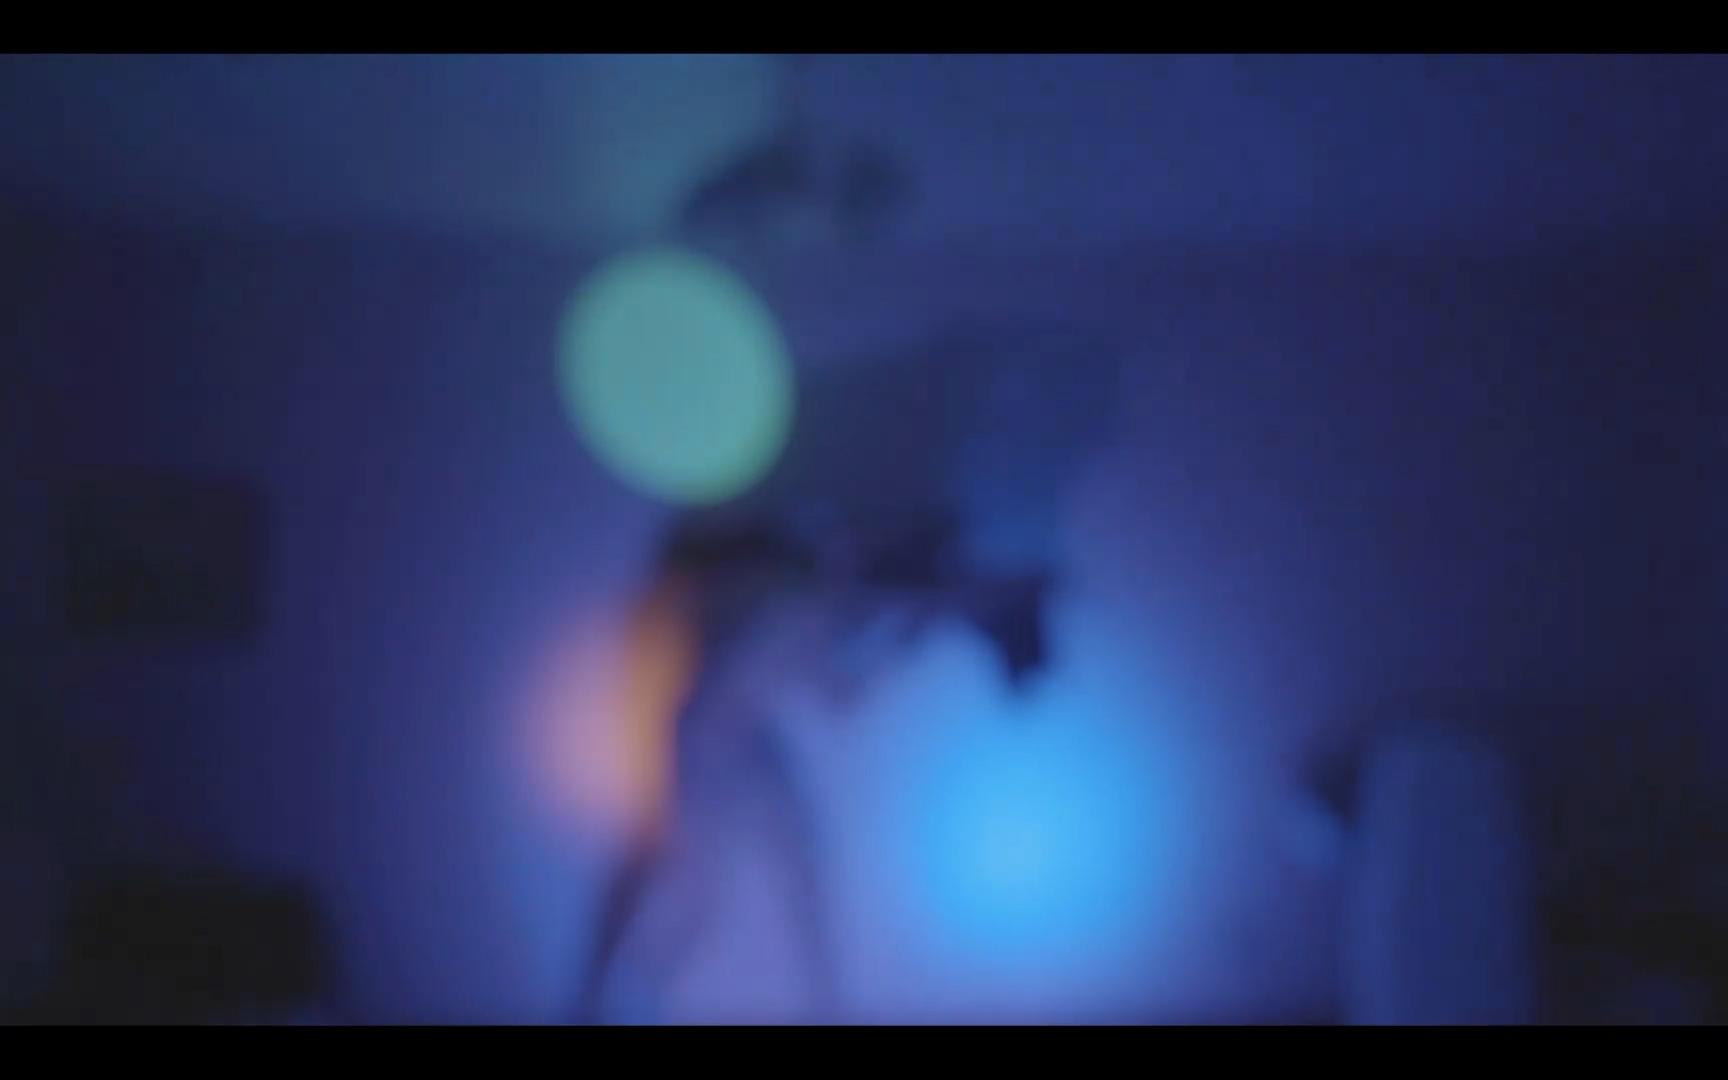 Corey Smith - Still from 'Etude 1'